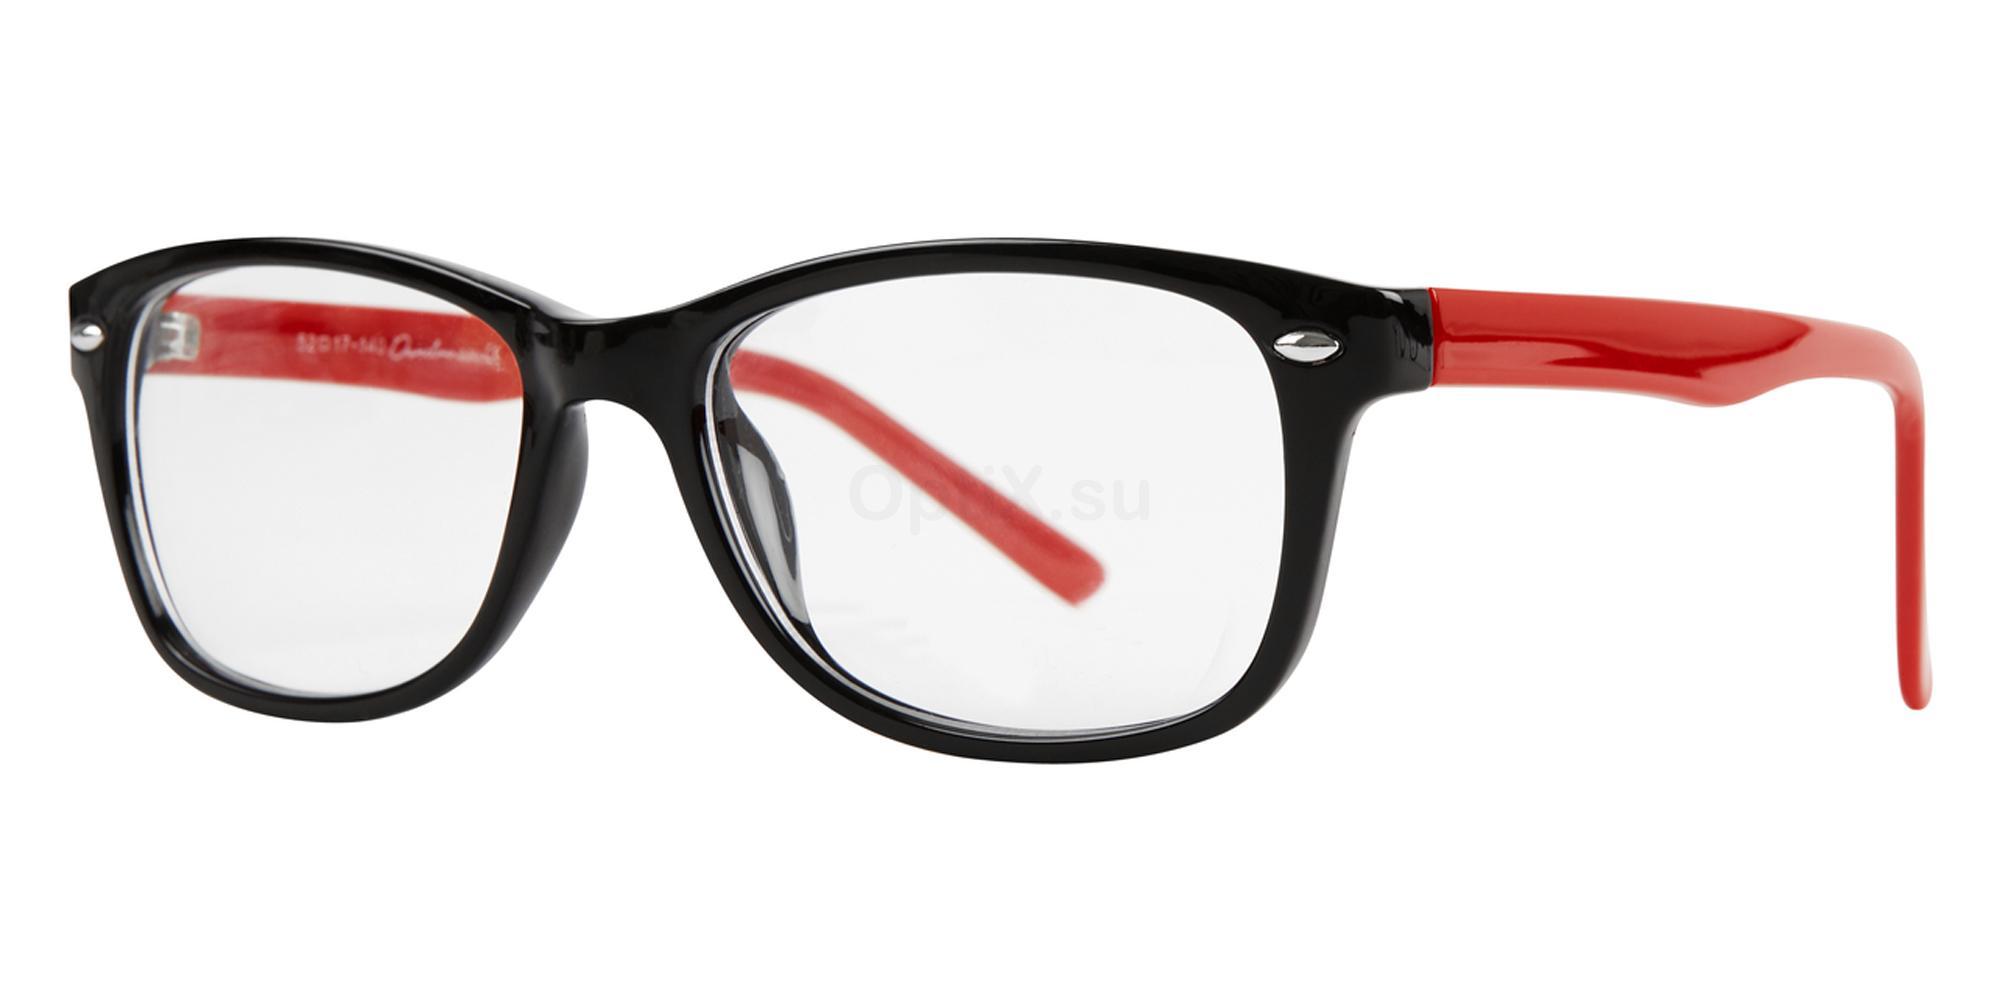 C1 Complete Mod 3 Glasses, Complete